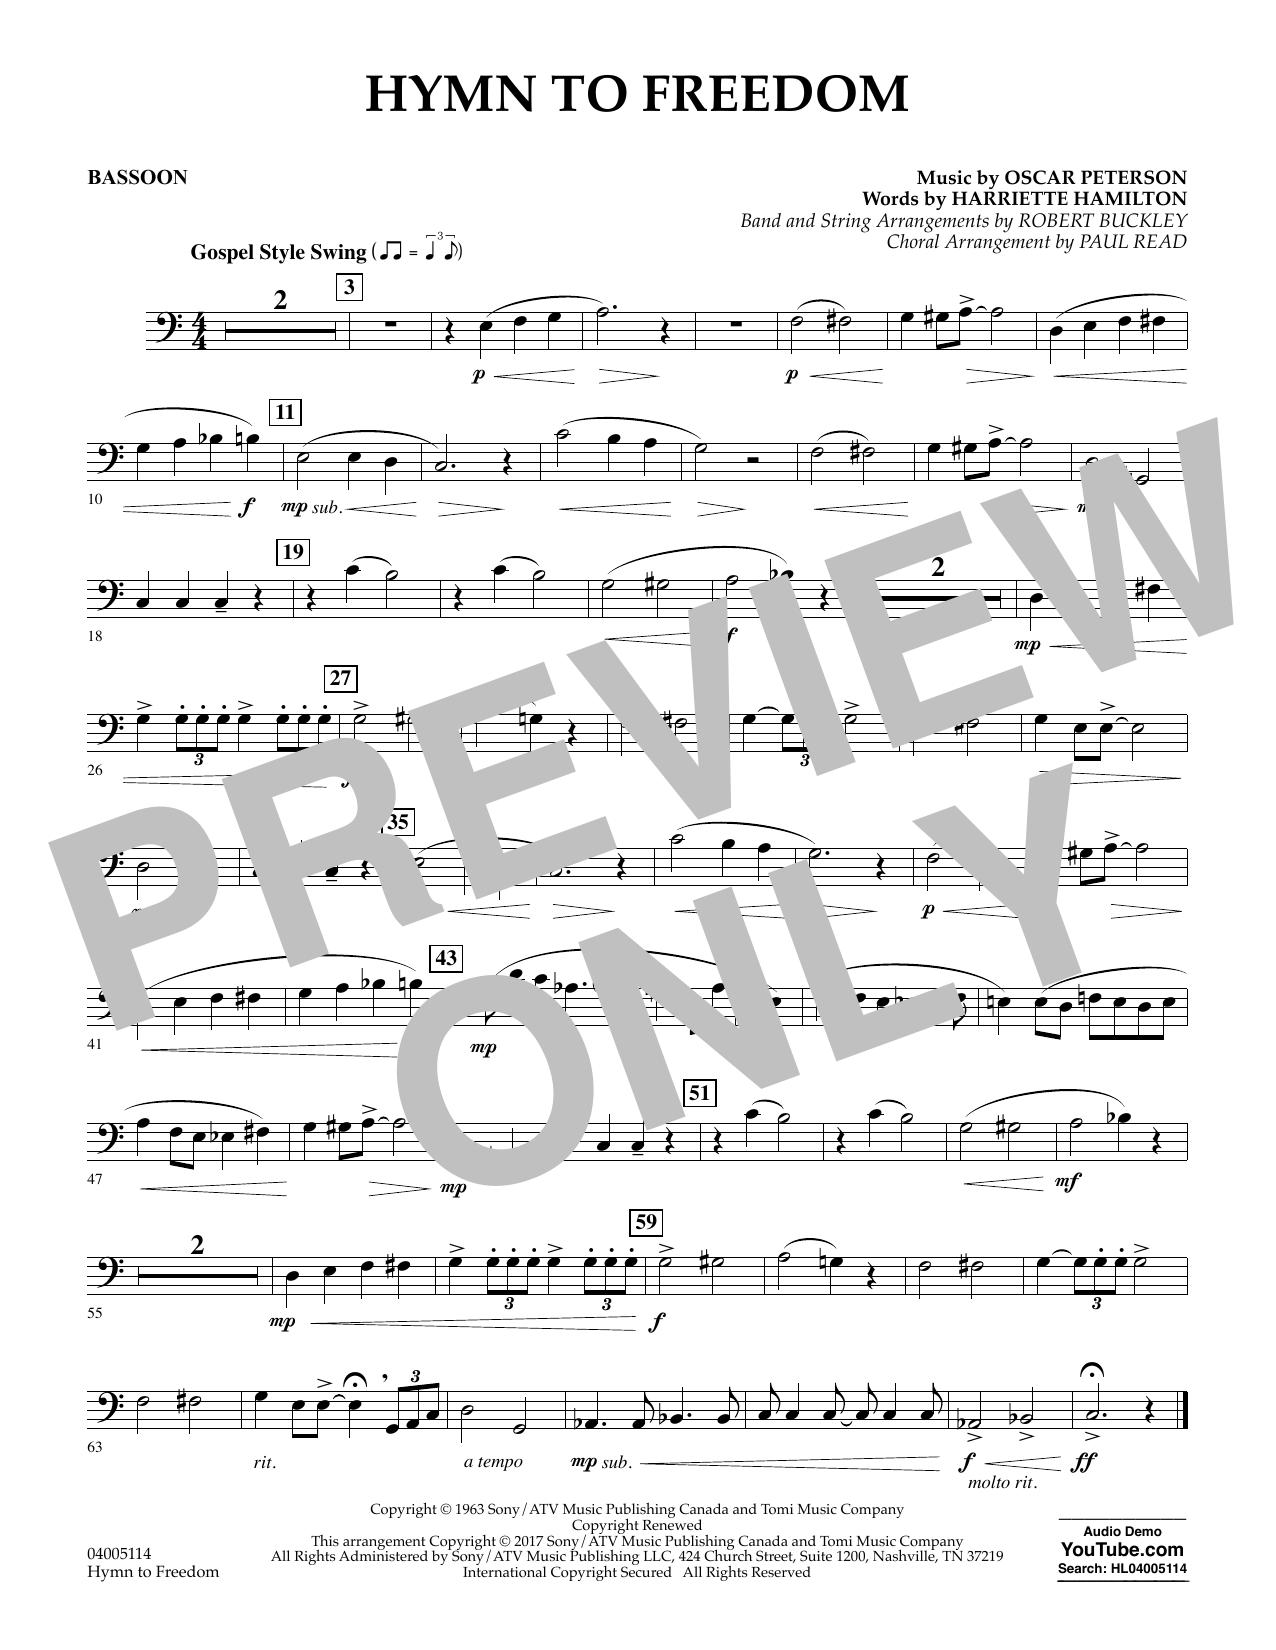 Hymn to Freedom - Bassoon Sheet Music